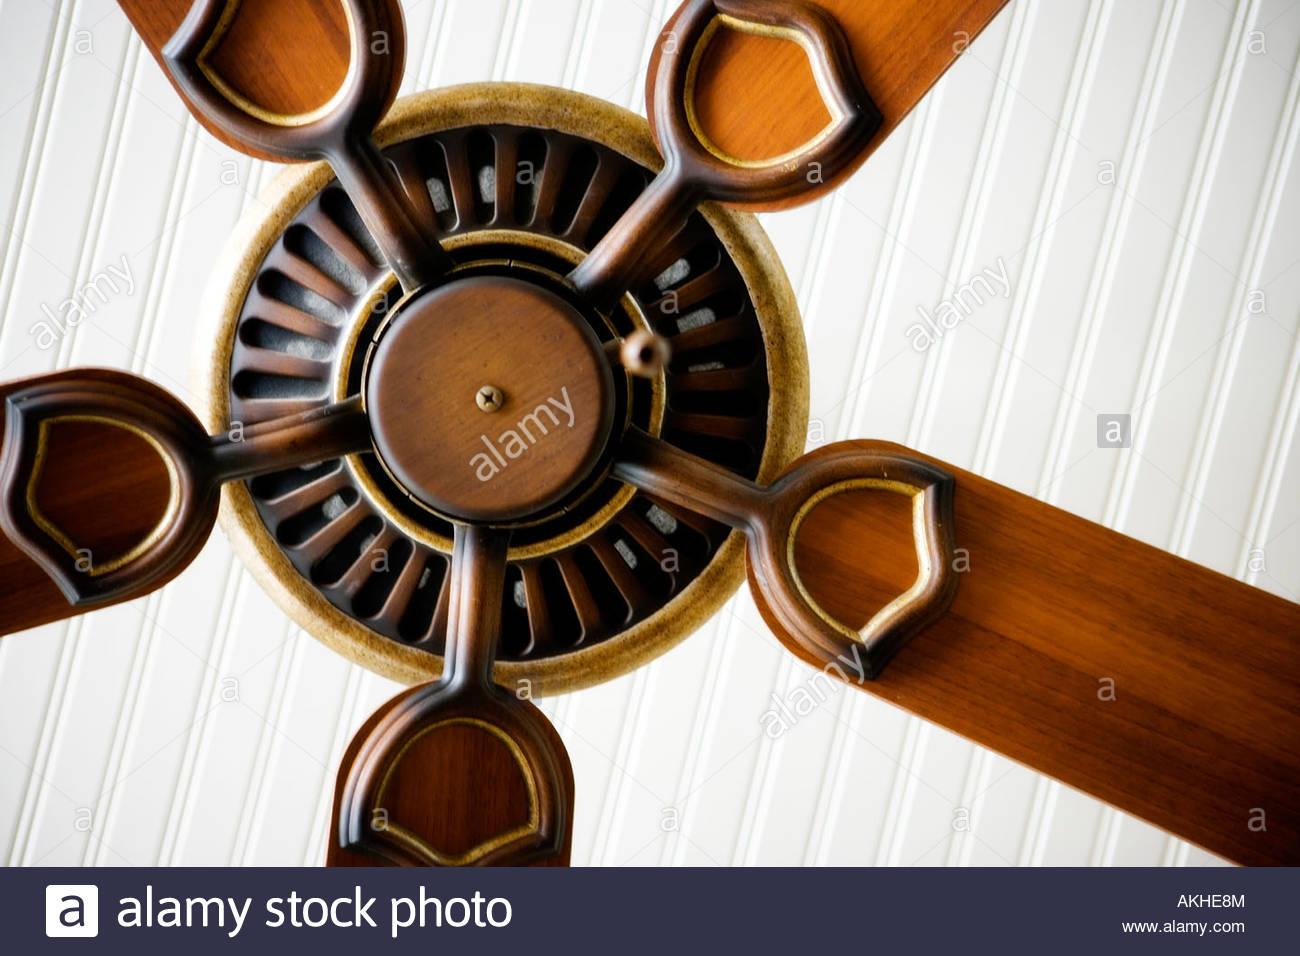 Detail of ceiling fan. Stock Photo